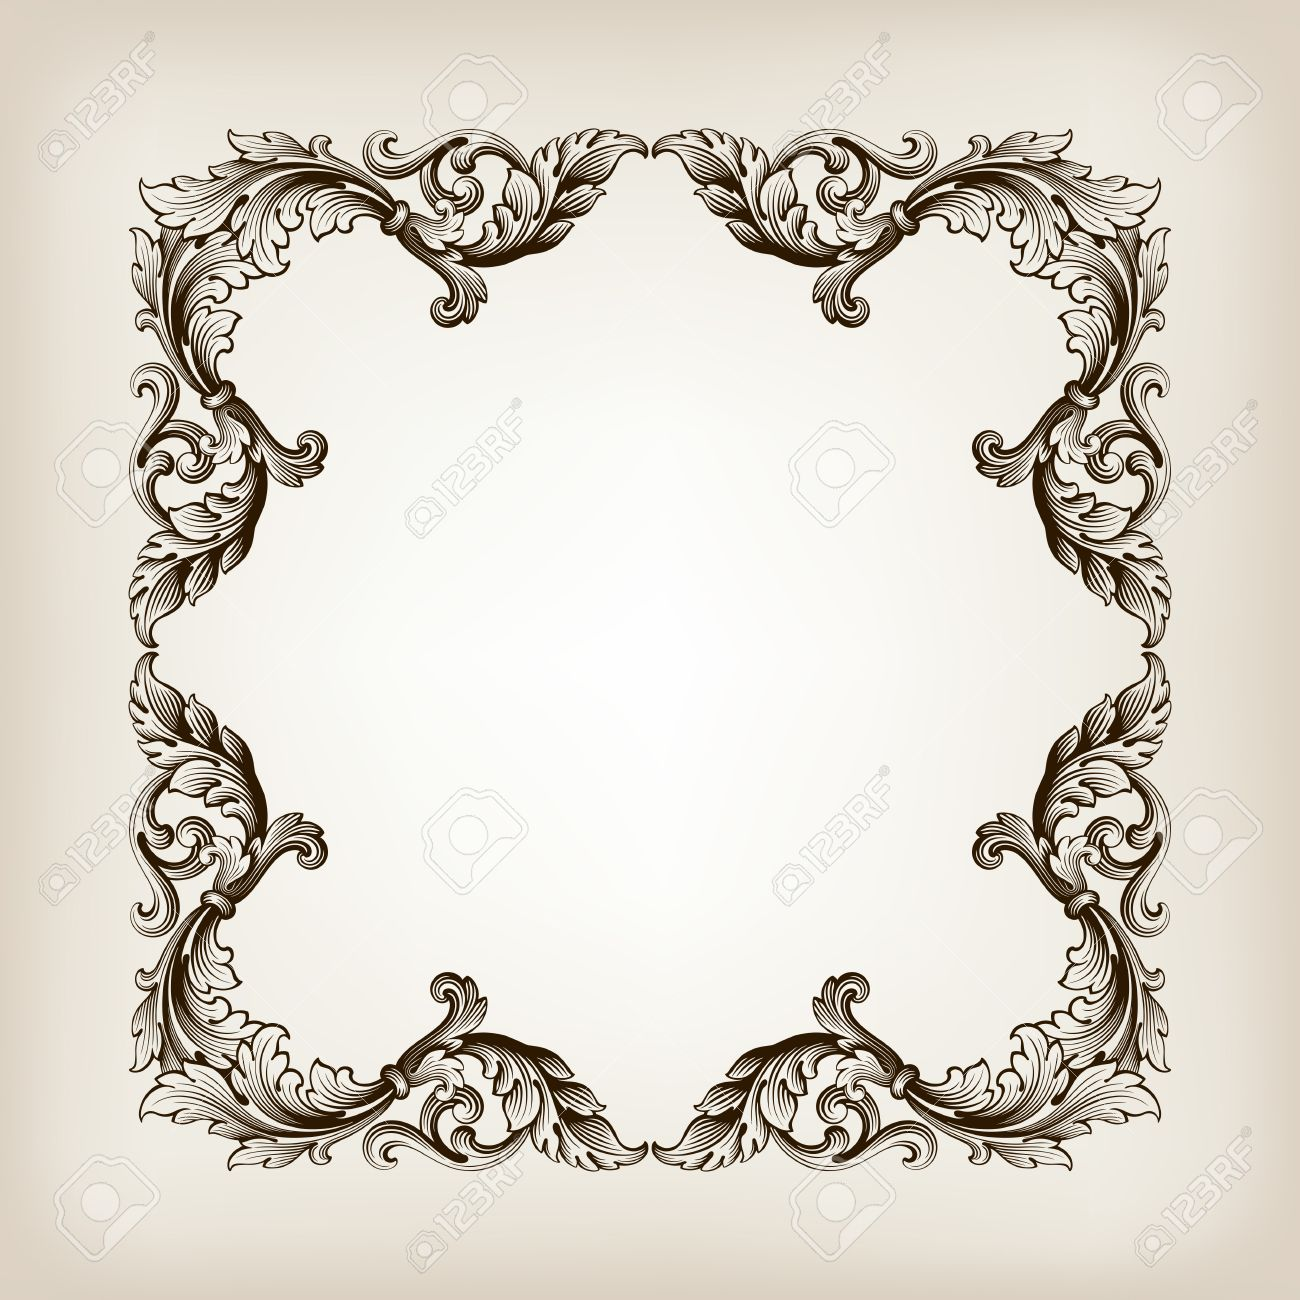 vintage border frame filigree engraving with retro ornament pattern - 20190916